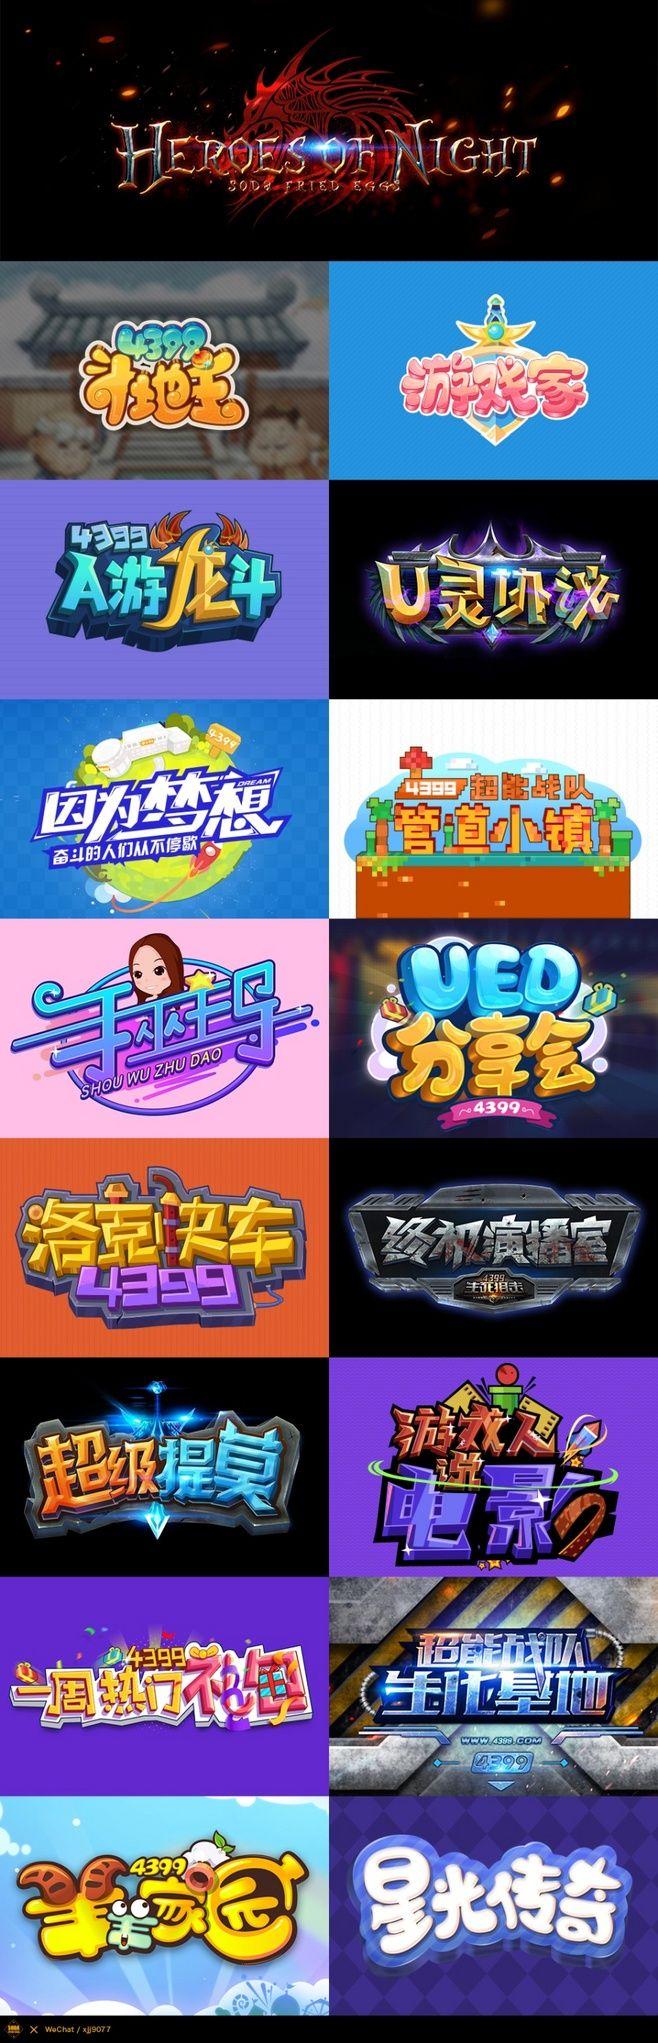 原创作品:15年游戏logo合集 / Game logo design 2d game art, Game